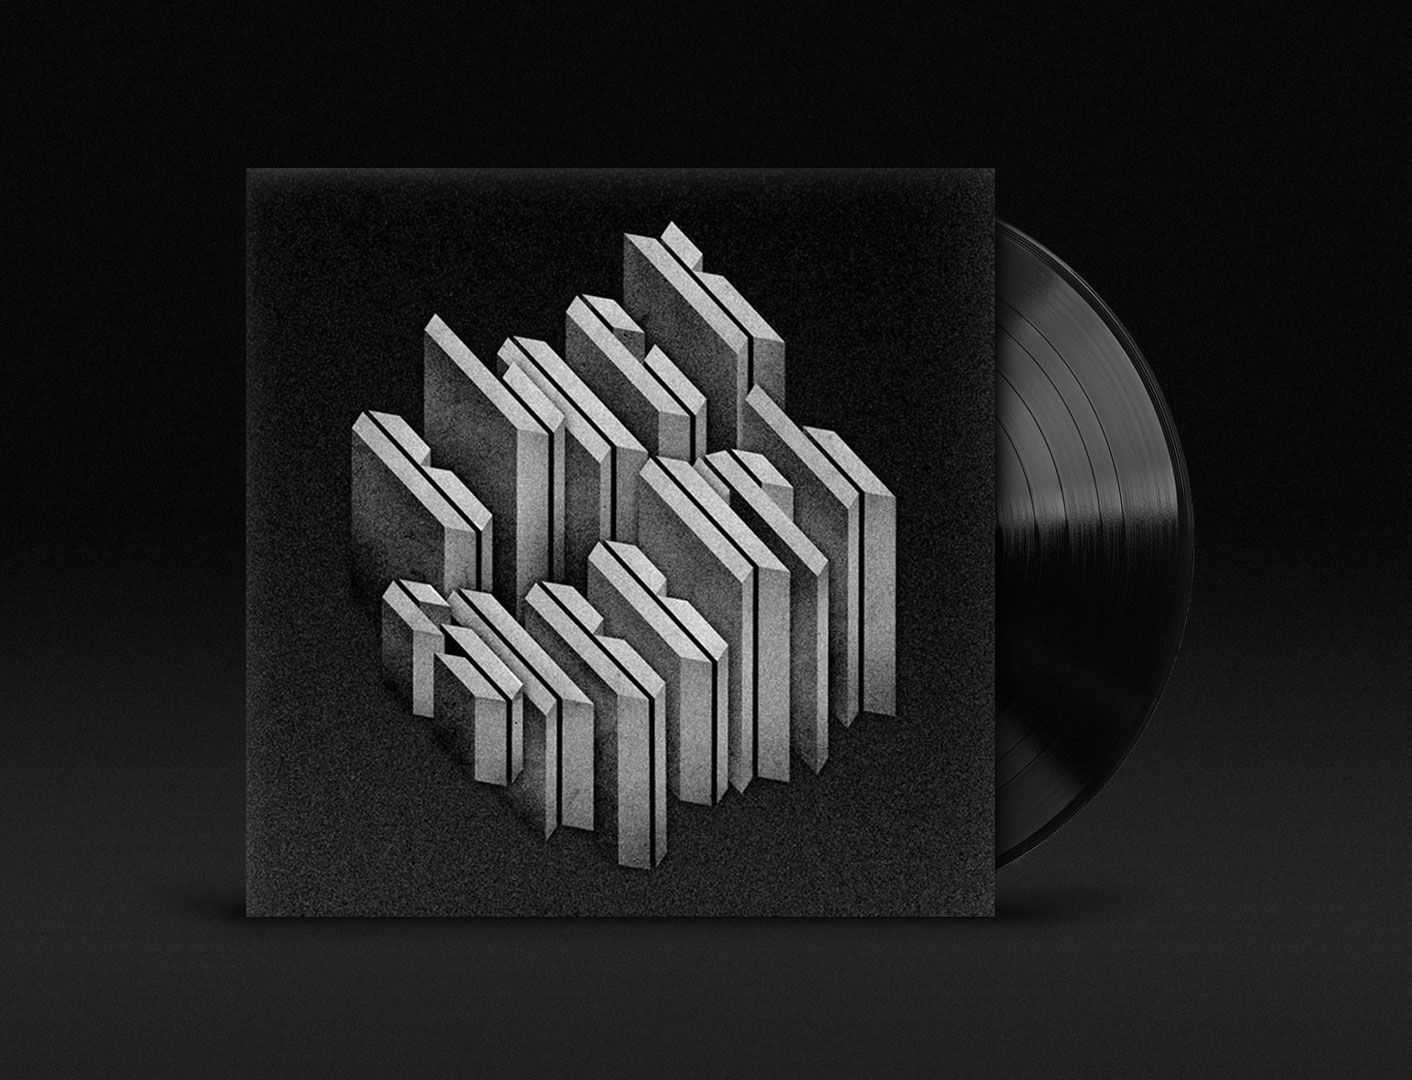 black-sabbath-vinyl.jpg